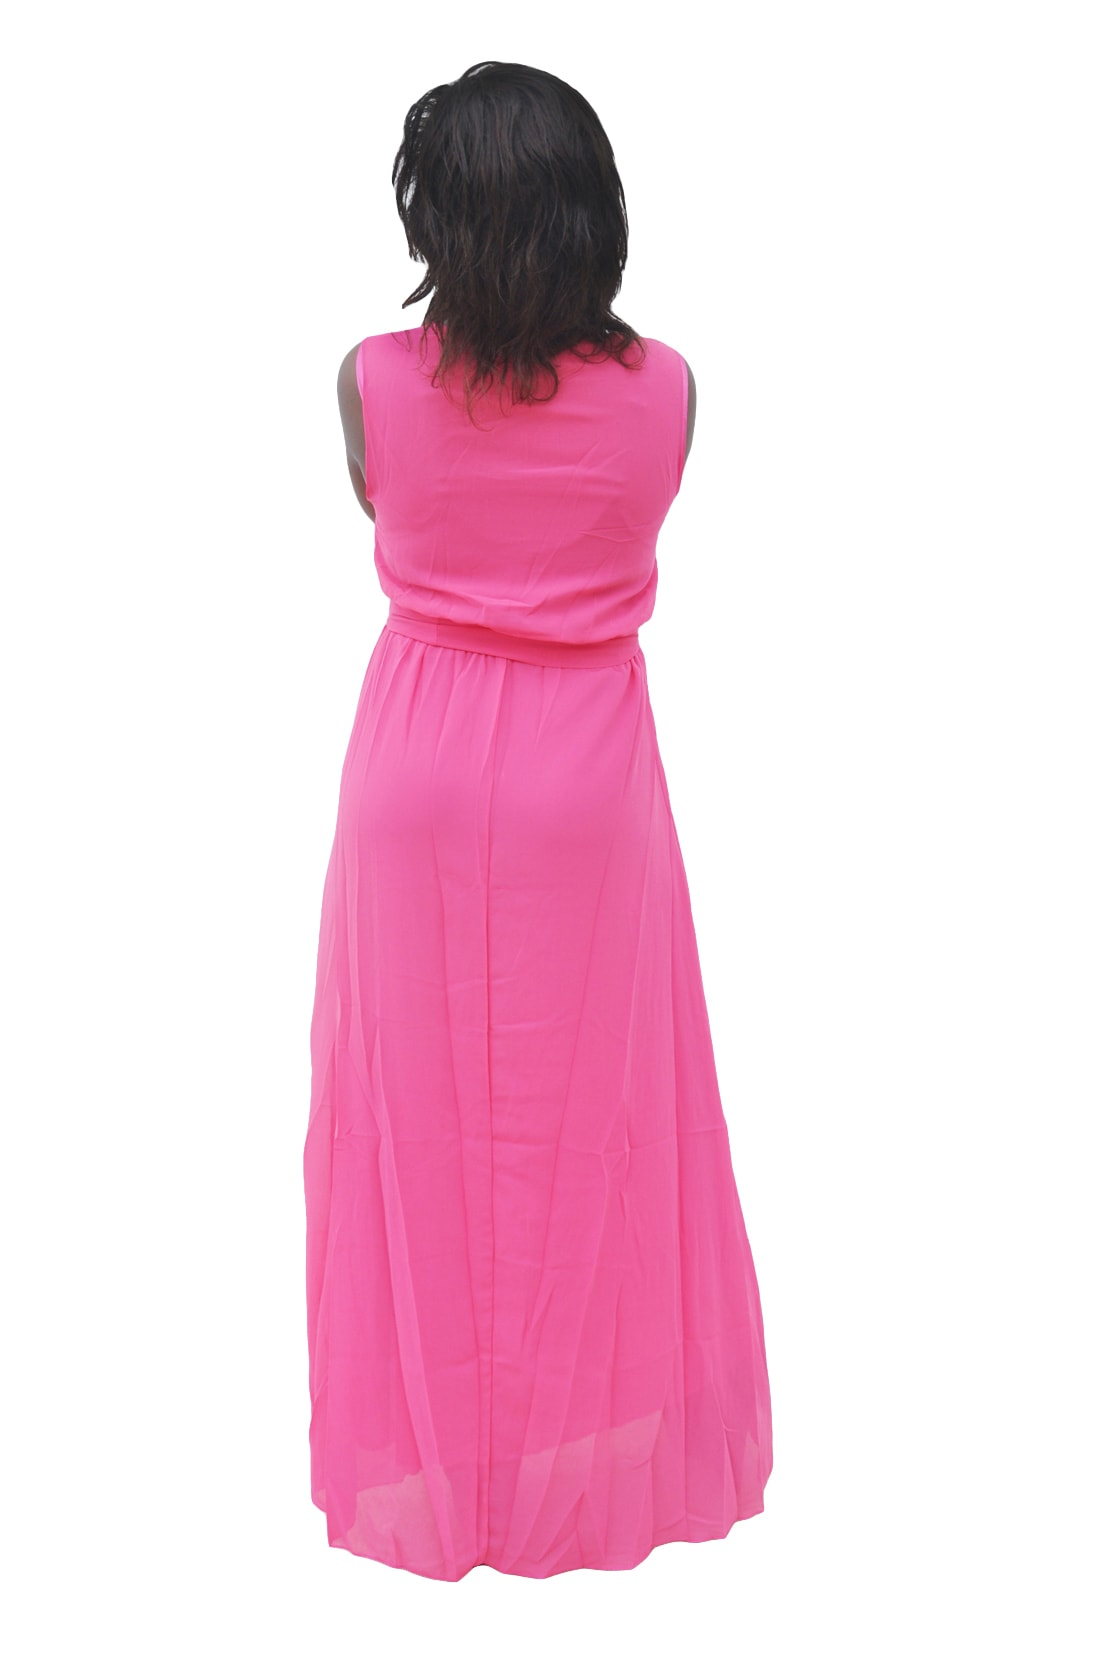 M0297 pink4 Bohemian Dresses maureens.com boutique